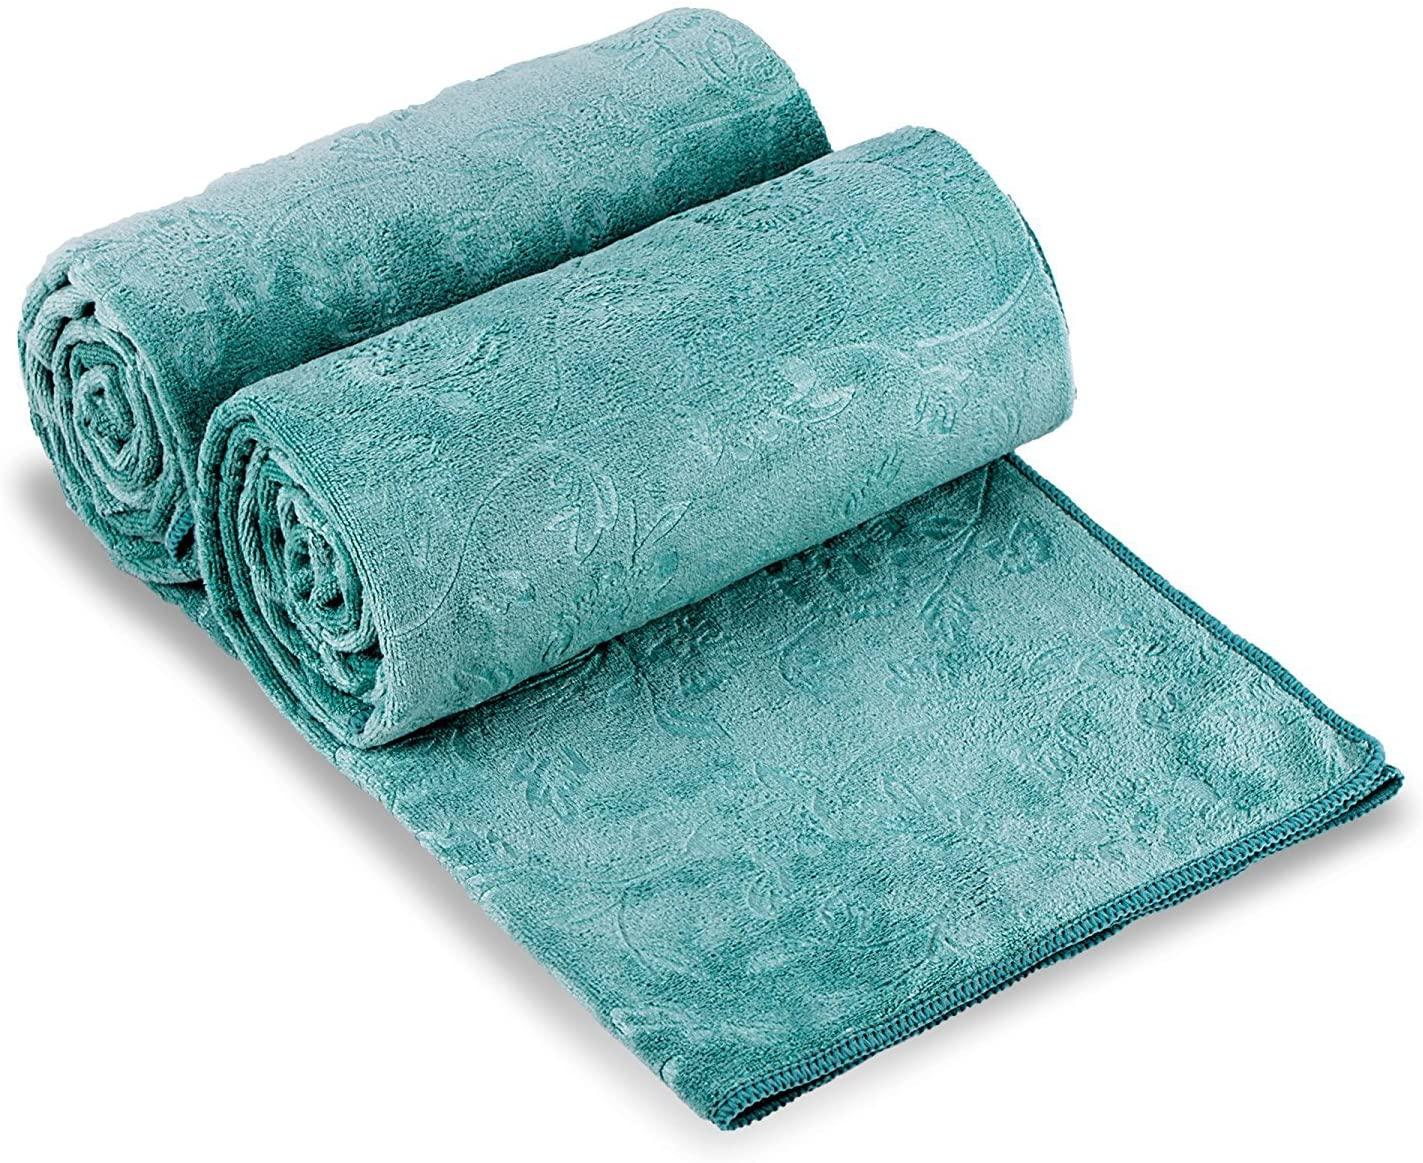 JML Microfiber Bath Towel, Oversized Bath Towel 2 Pack(30